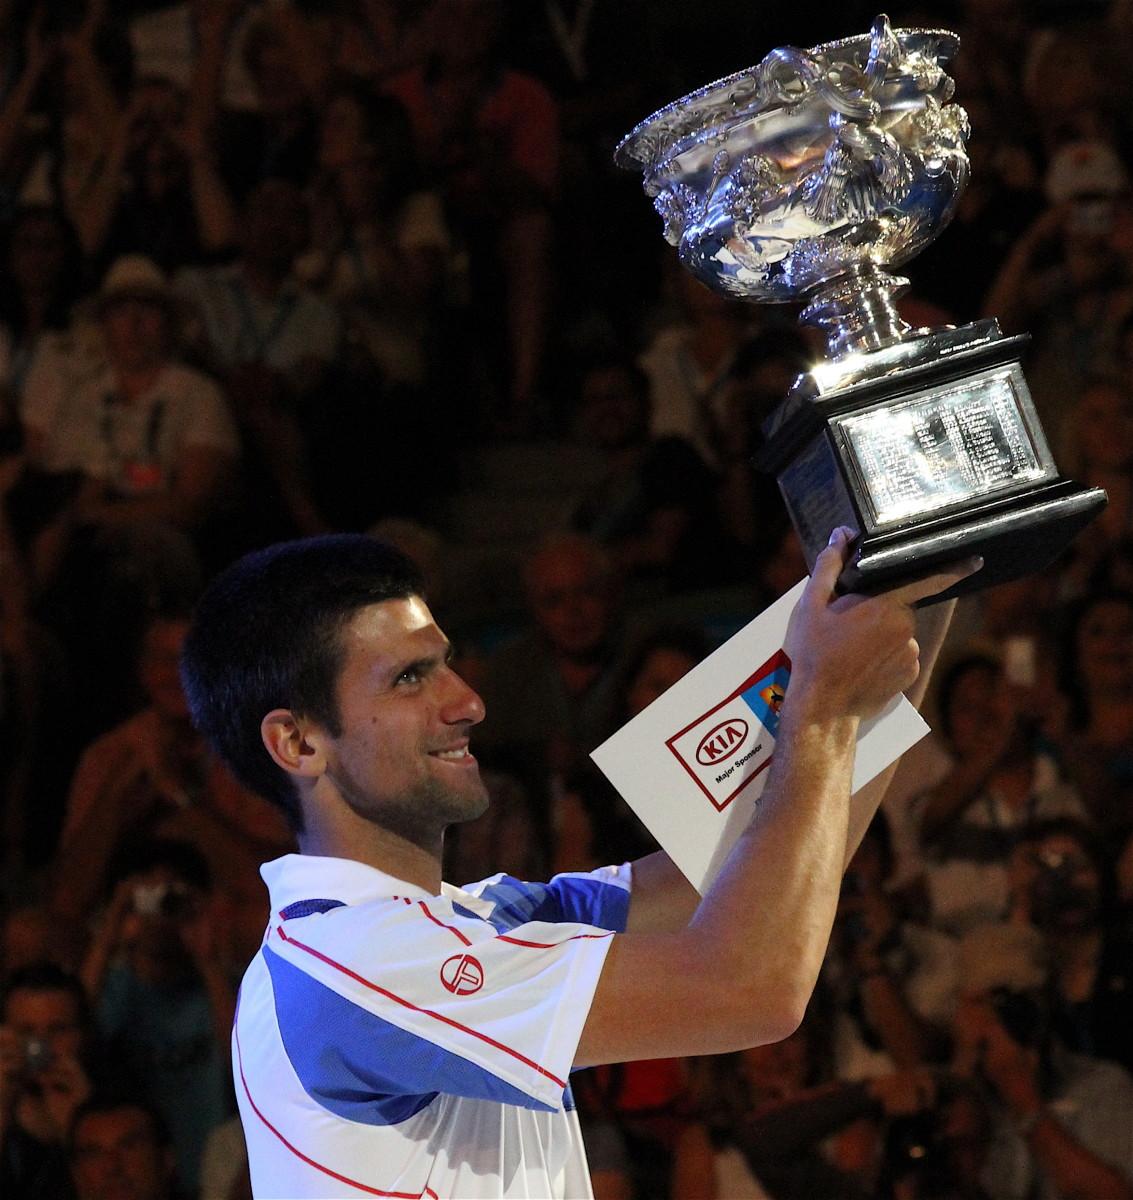 2011 Australian Open Champ